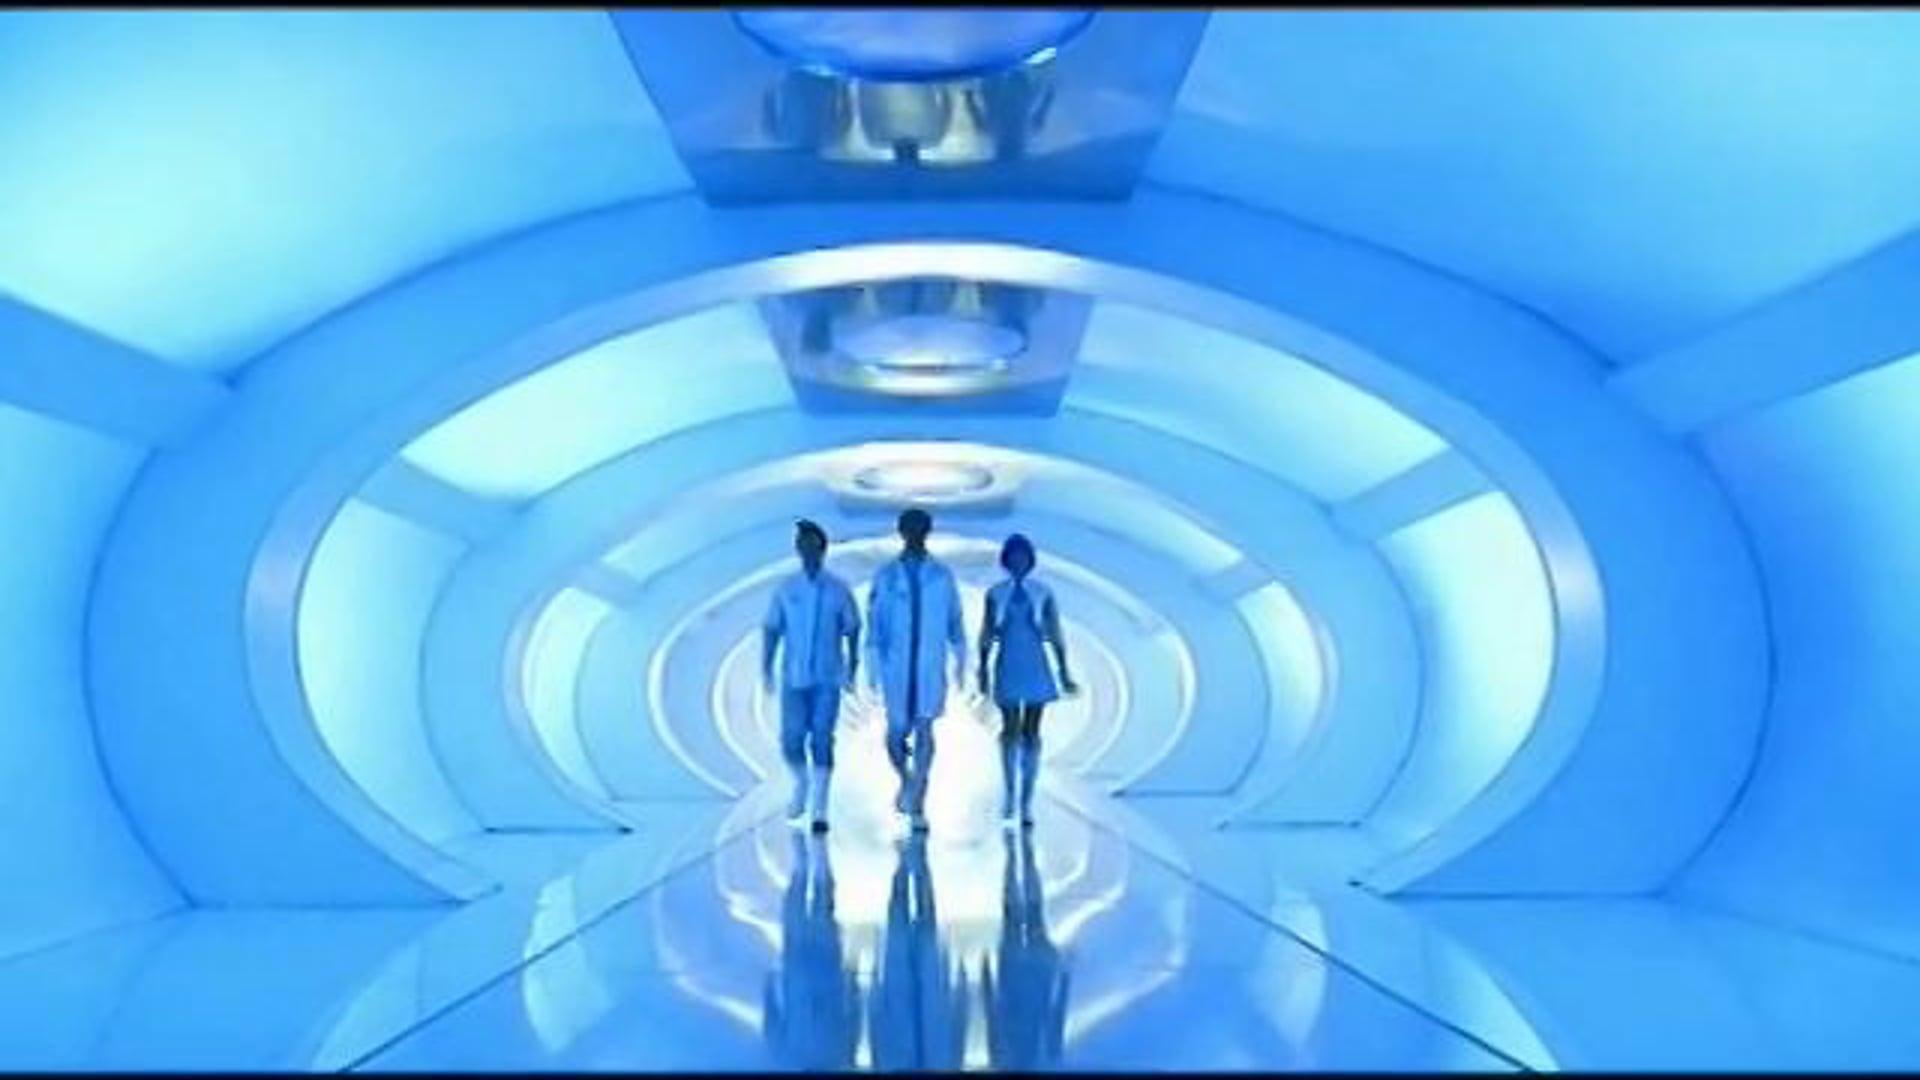 In Orbit - TVC/Trailer - Wrigley/Orbit